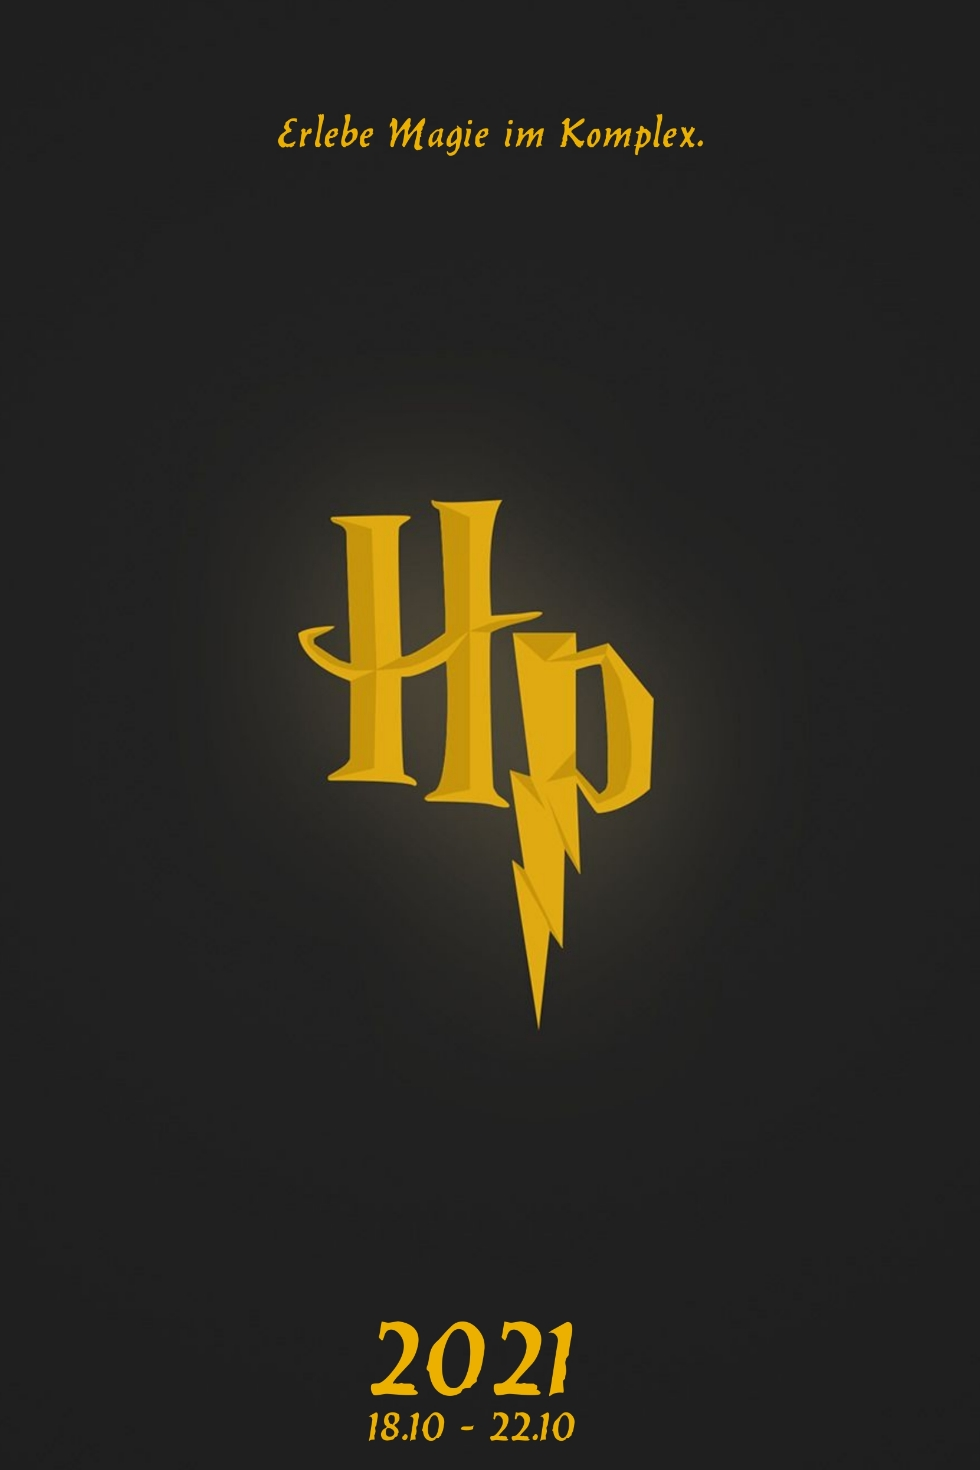 <b>22.10.2021</b><br>14:00 Uhr<br><b>Harry Potter Filmmarathon</b>